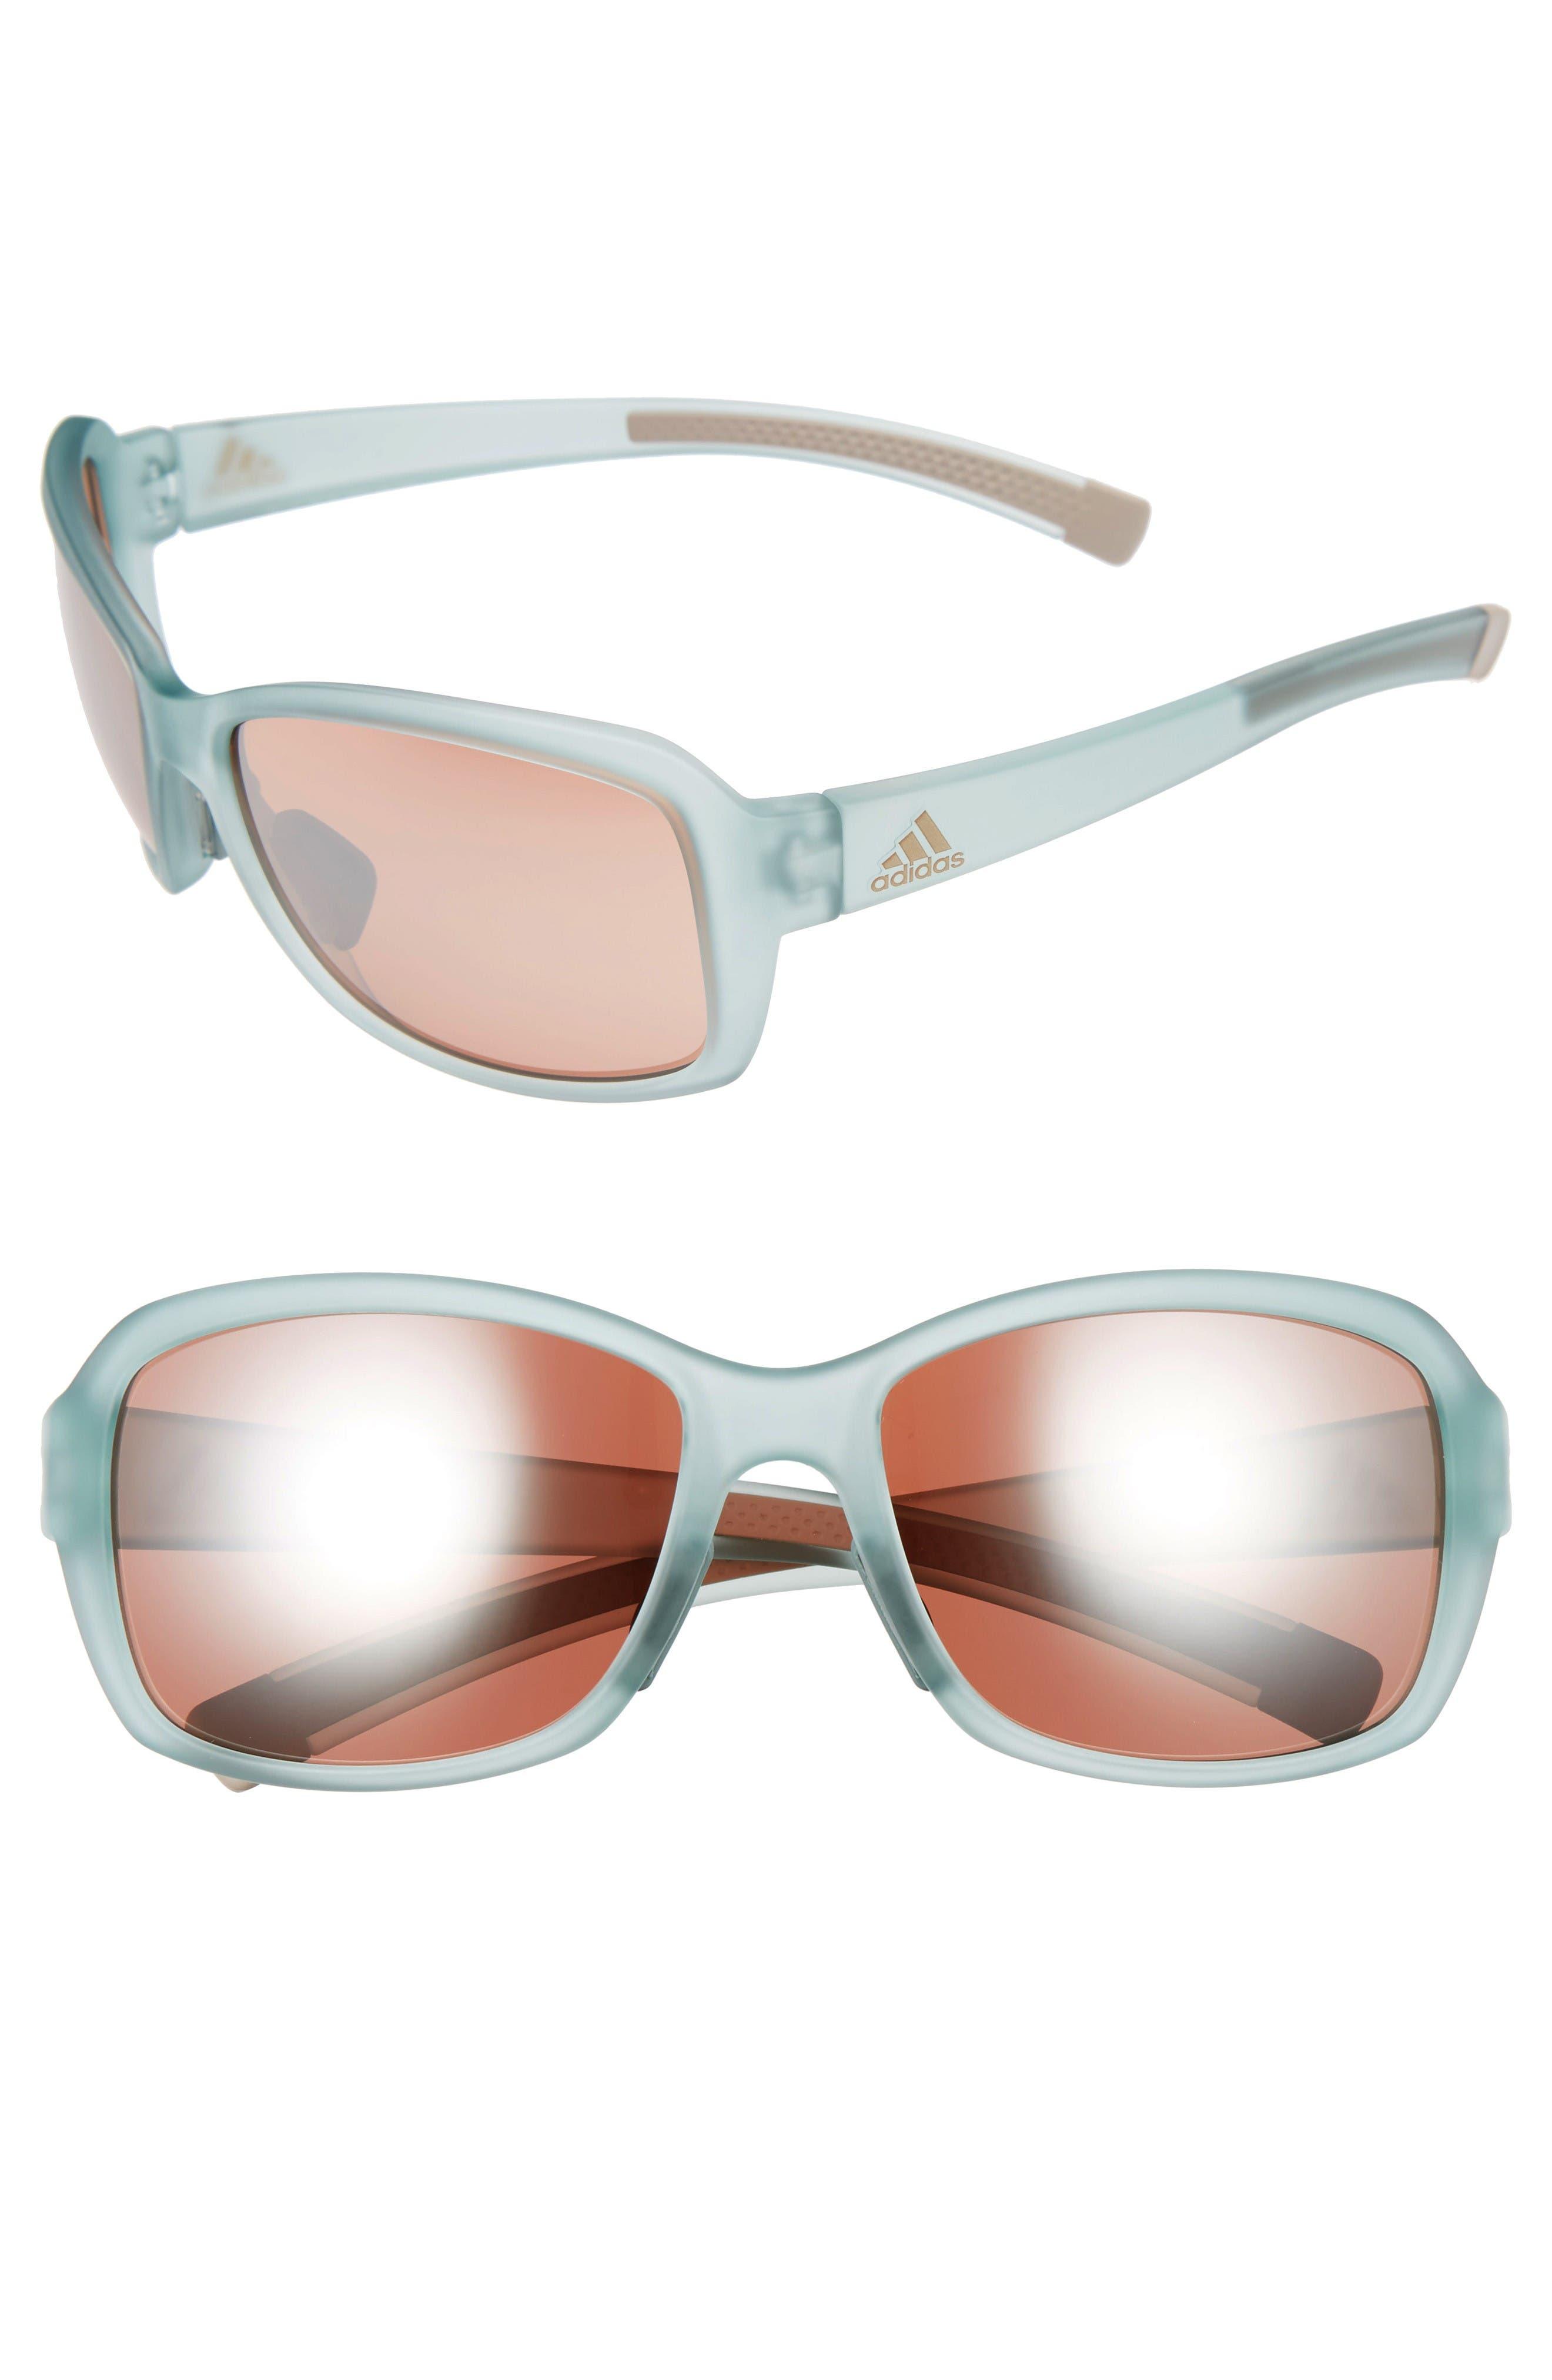 Main Image - adidas Baboa 58mm Sunglasses